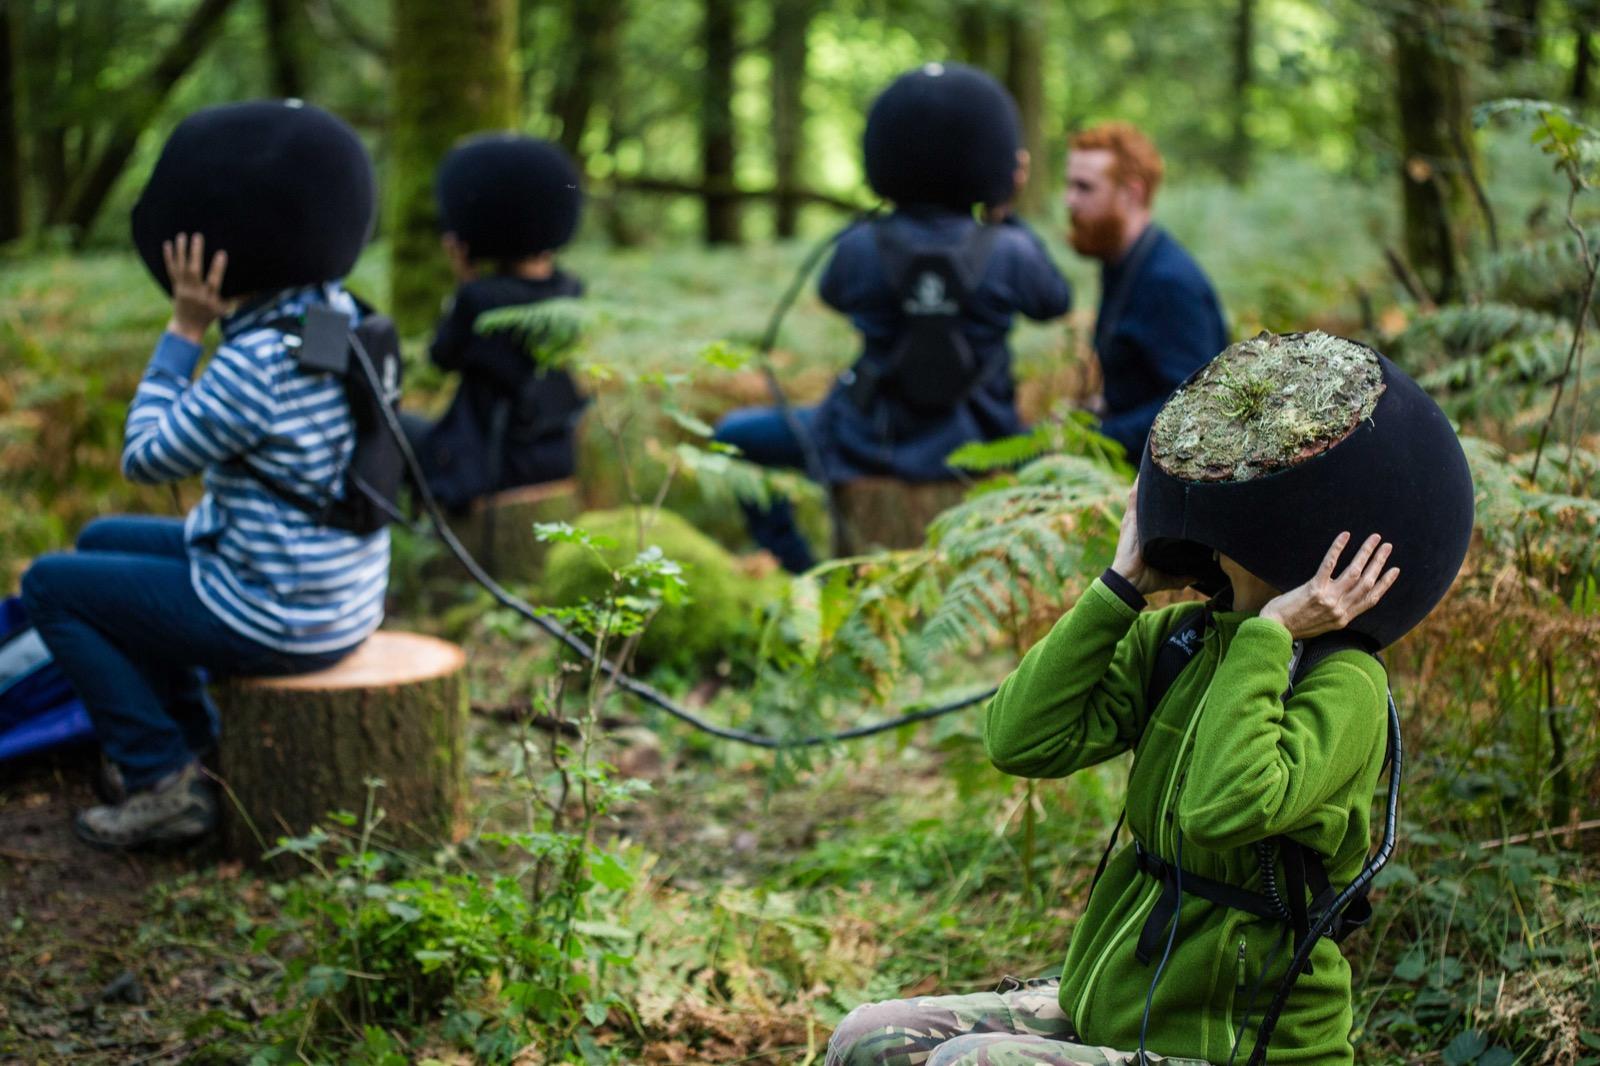 Espectadores con el casco de realidad virtual de 'In the Eyes of the Animals' - Marshmallow Laser Feast